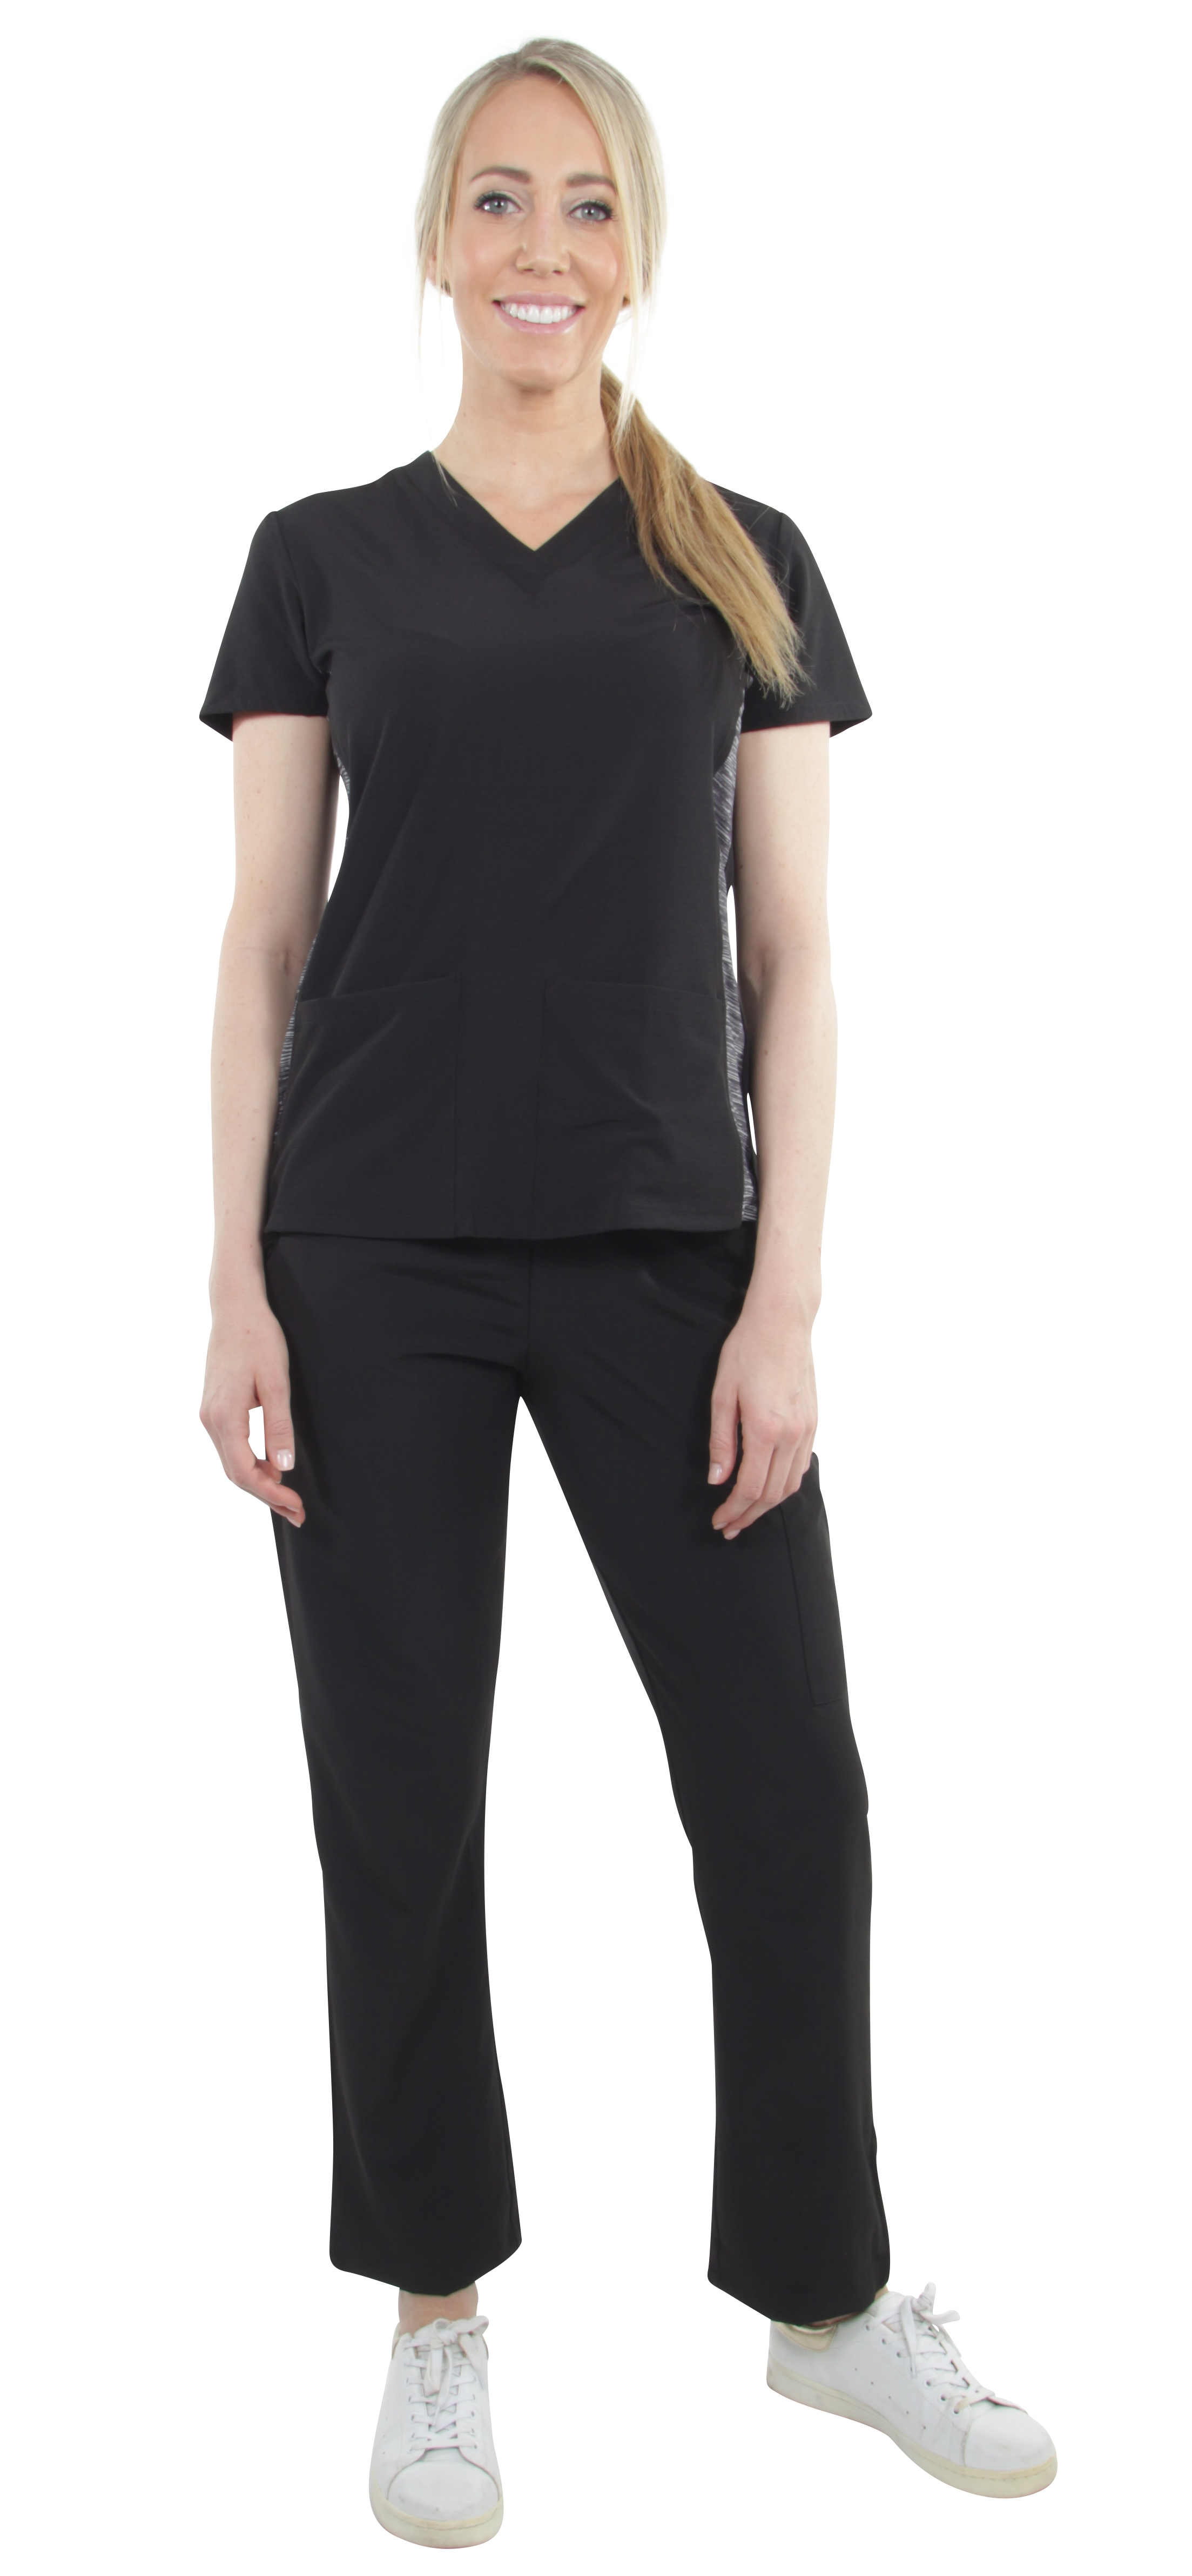 Unisex-Performance-Stretch-Medical-Uniform-Five-Pockets-V-Neck-Scrubs-Sets miniature 15